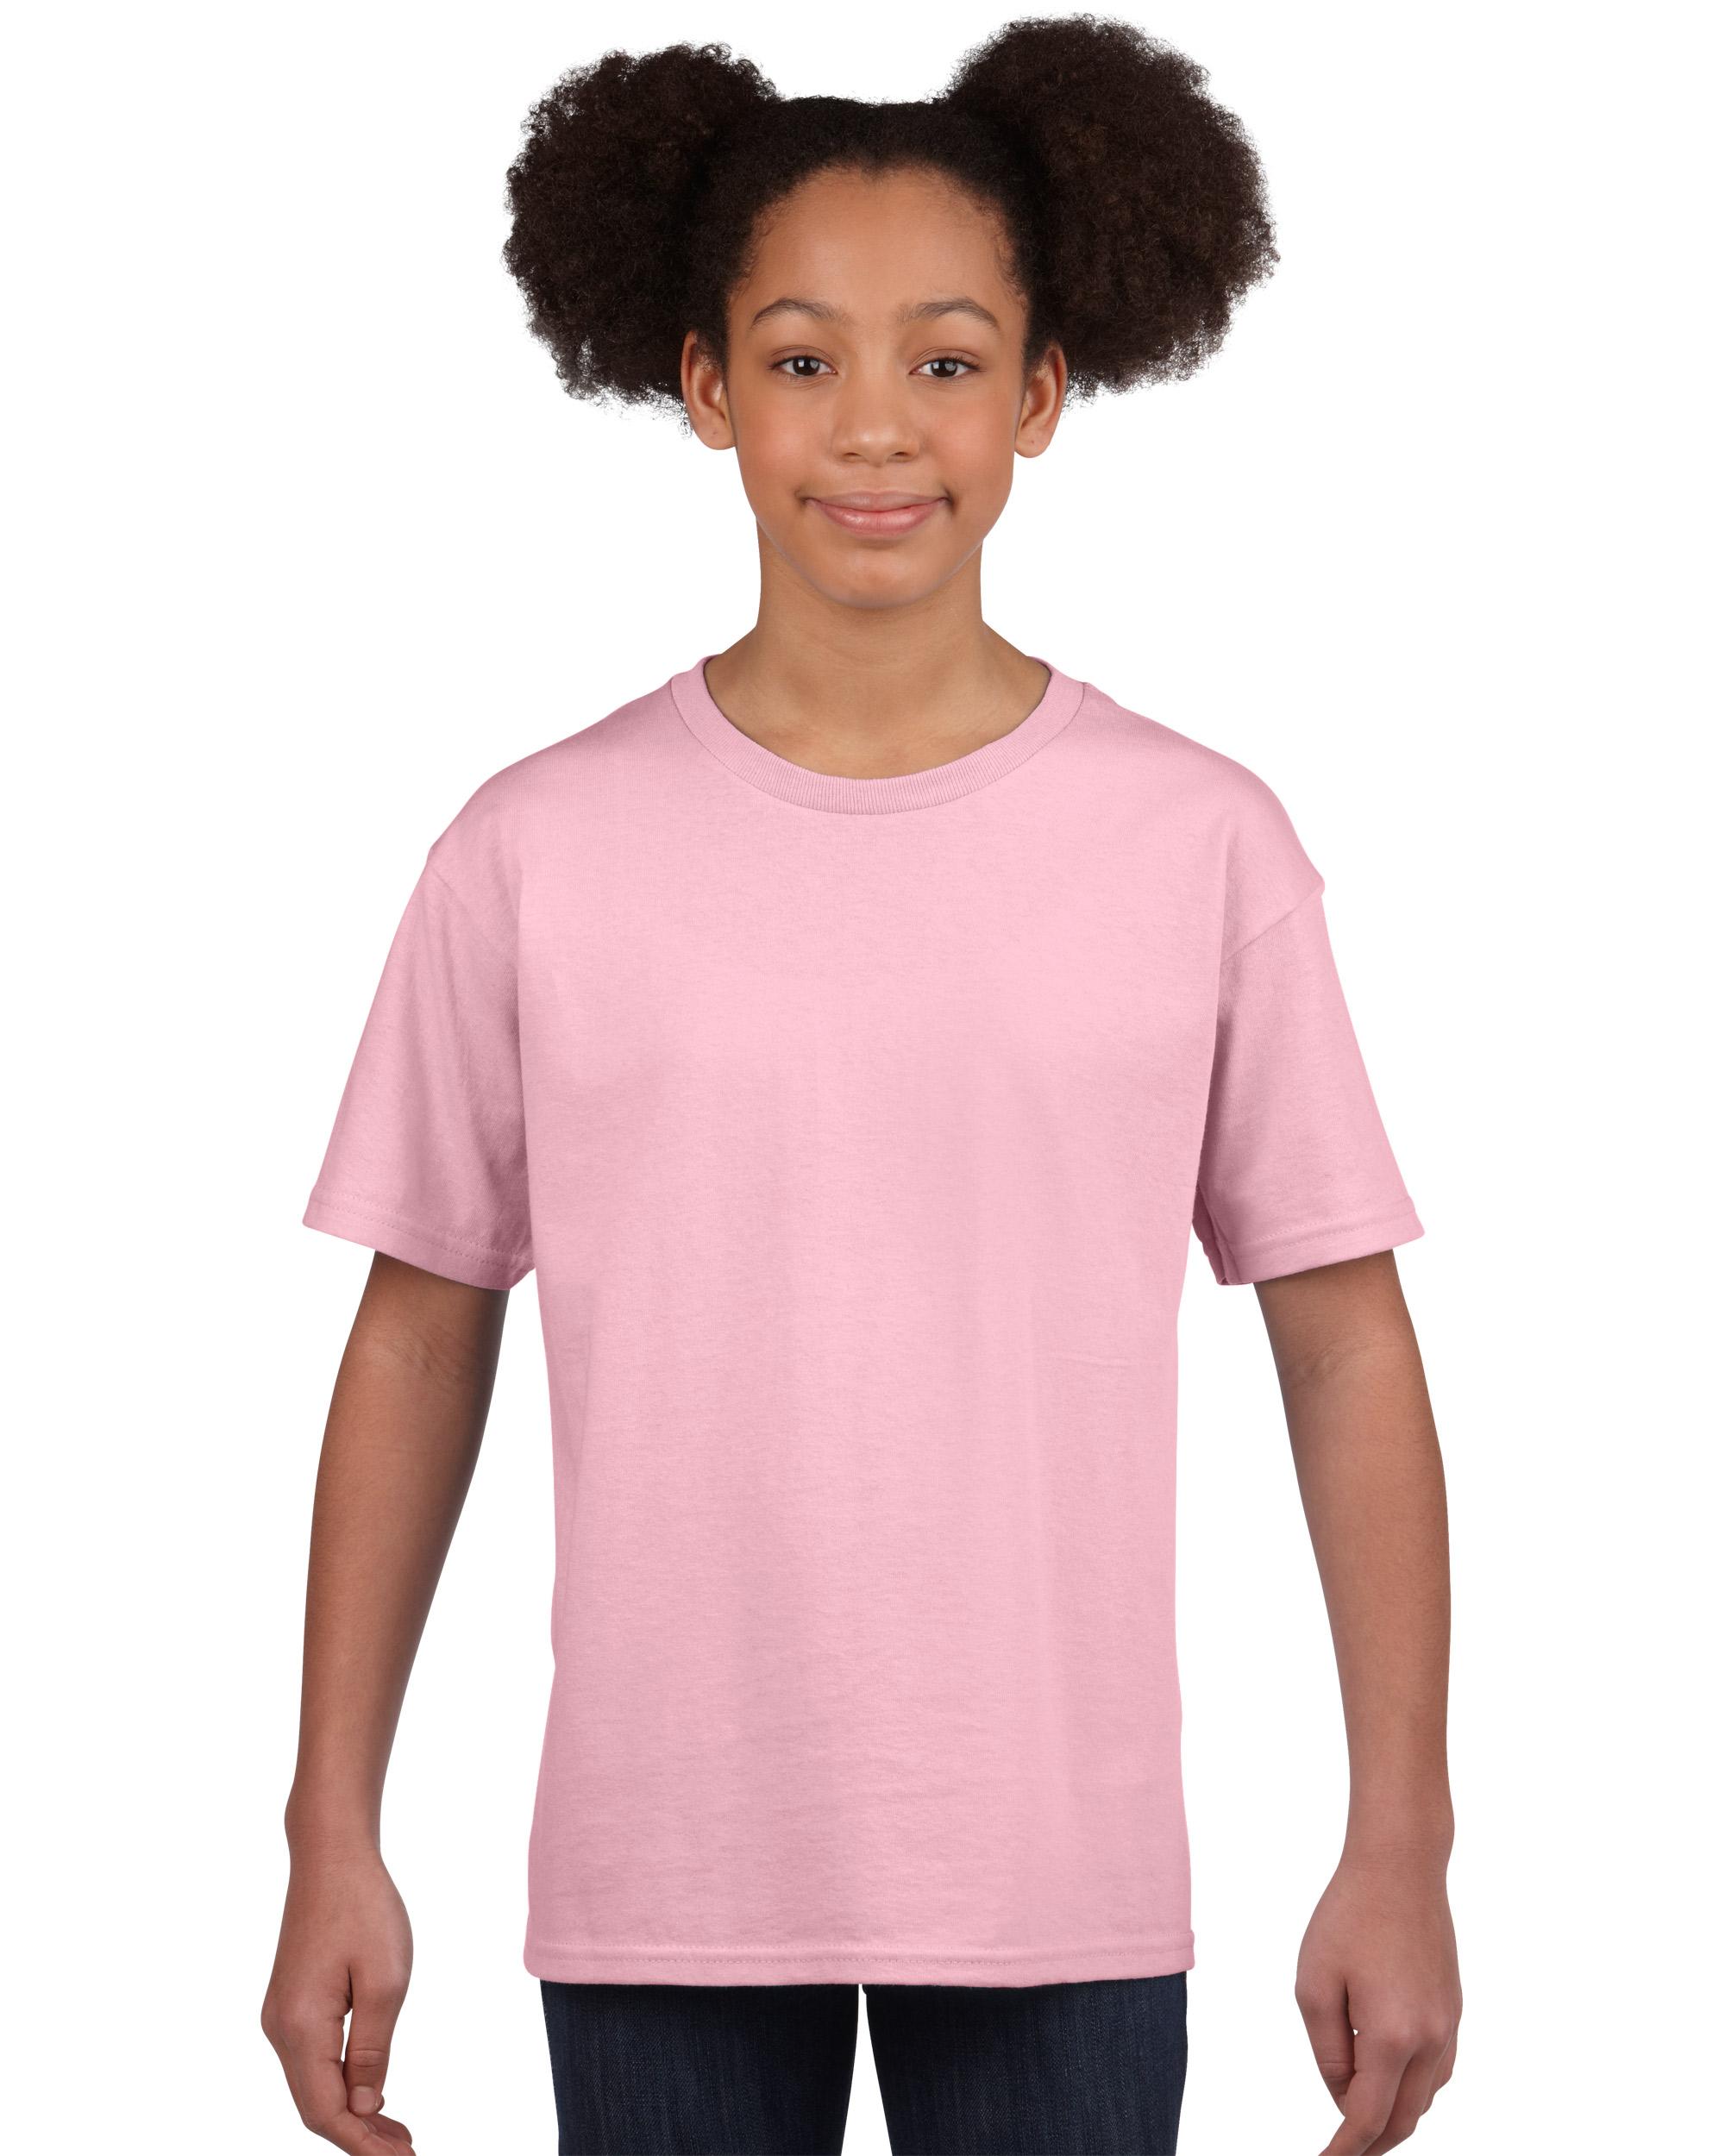 T恤(亲子装儿童款)